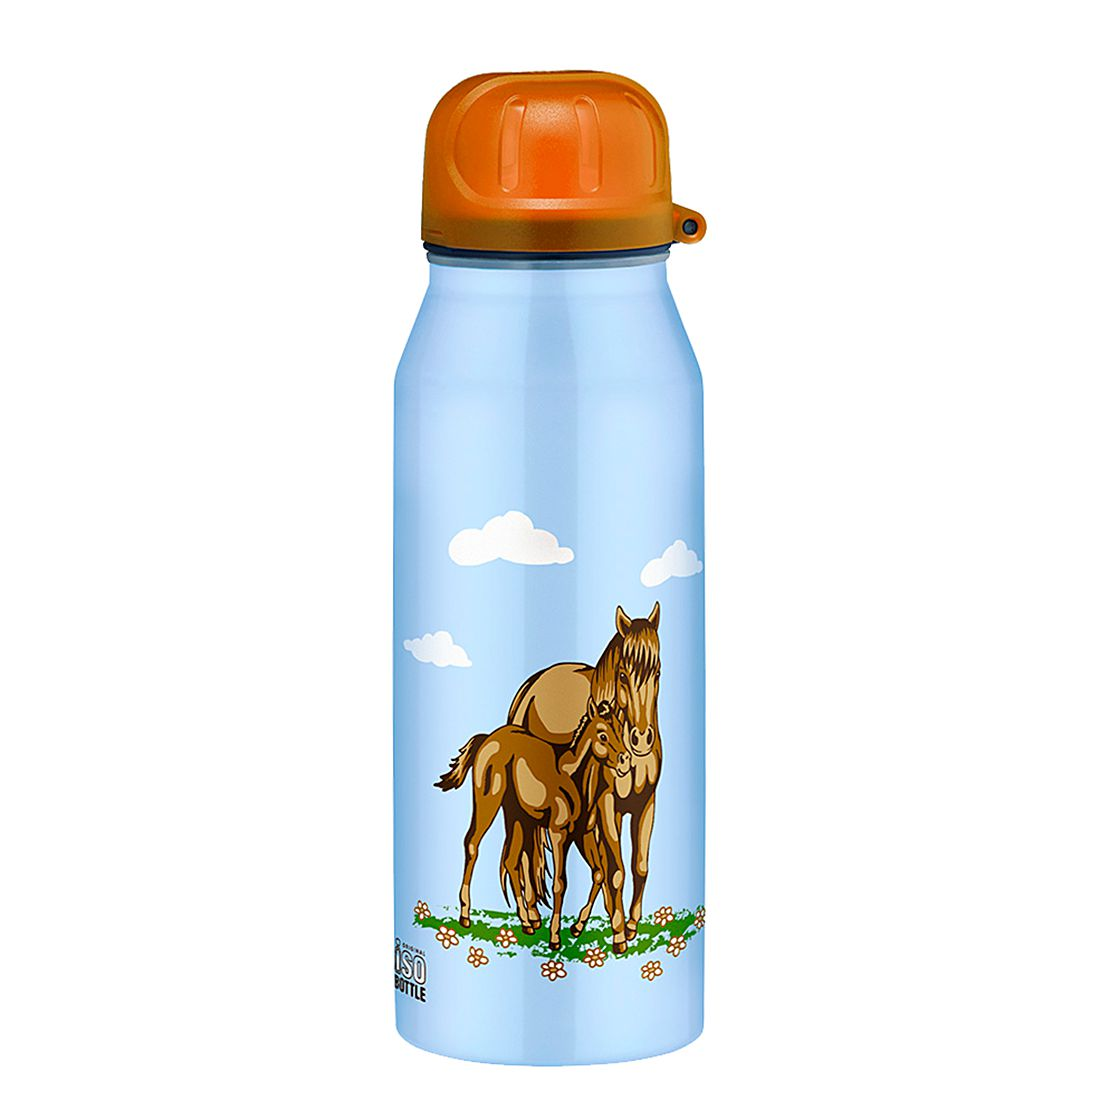 IsoBottle – Pferde Blau, 0,35 l, Alfi günstig bestellen